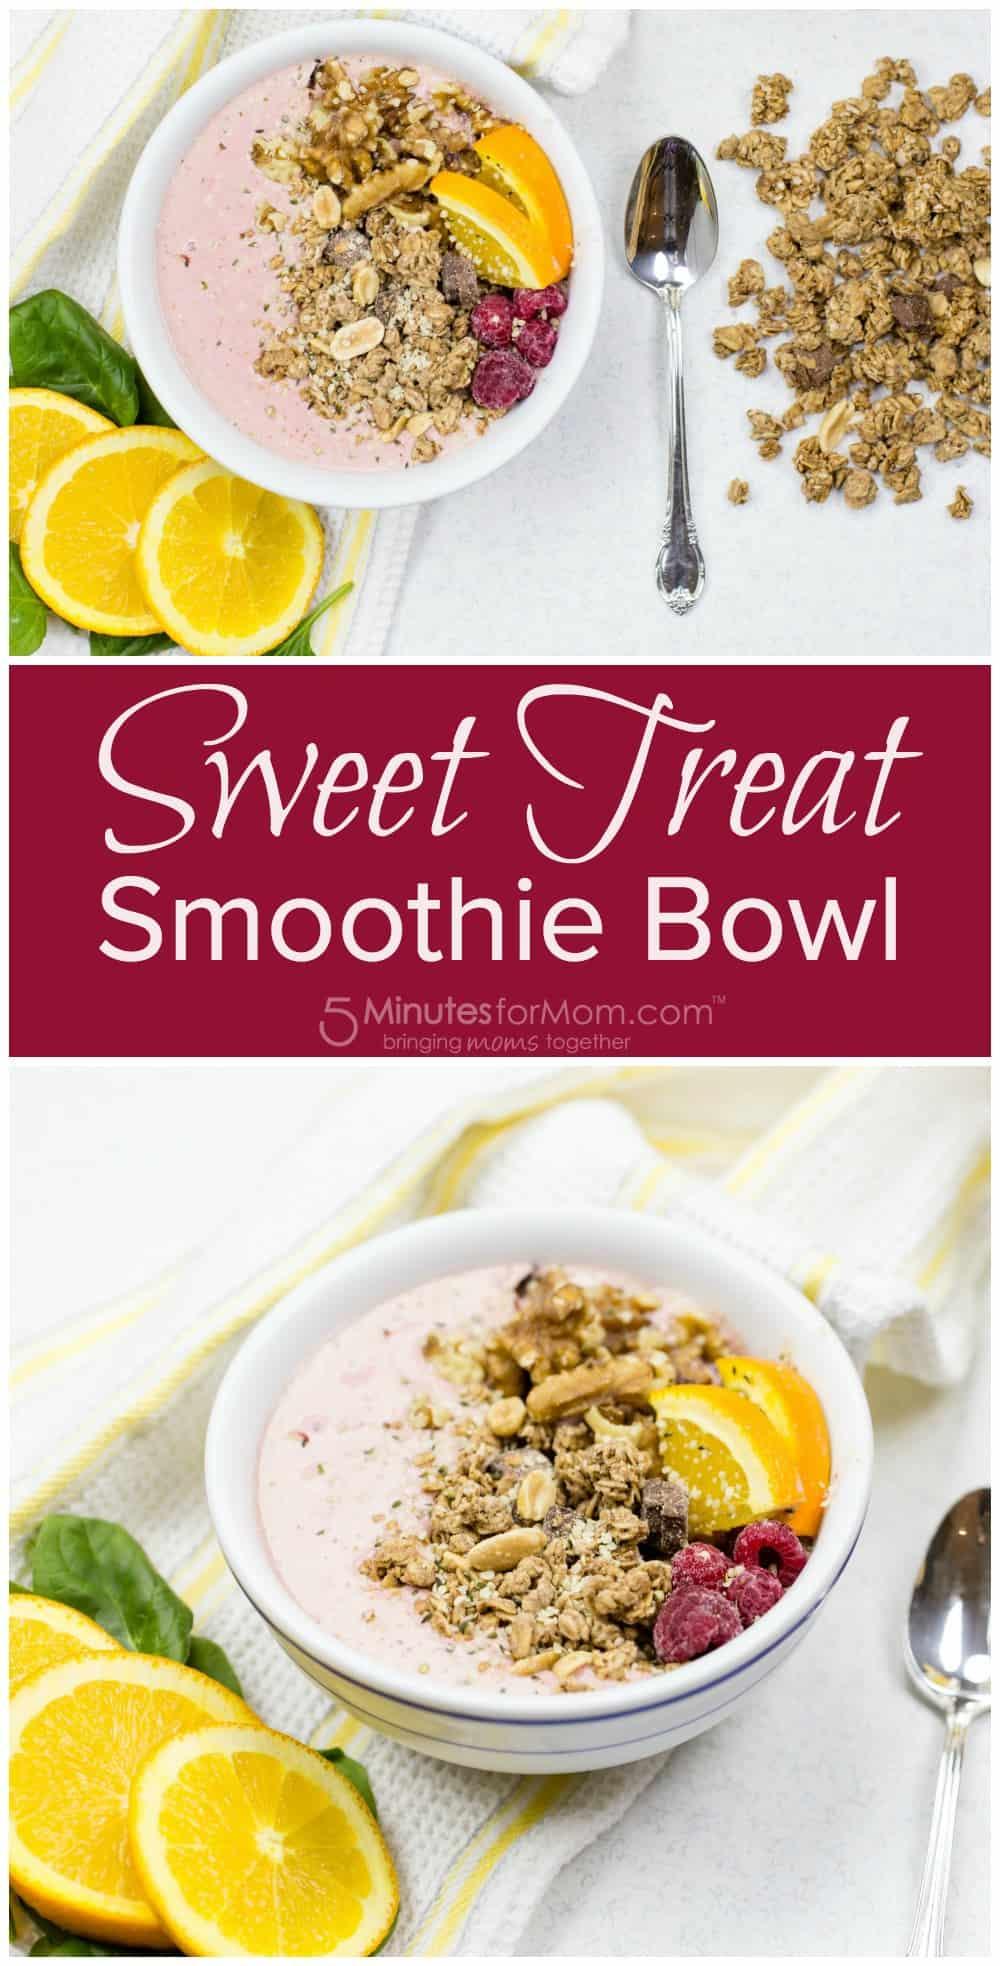 Sweet Treat Smoothie Bowl